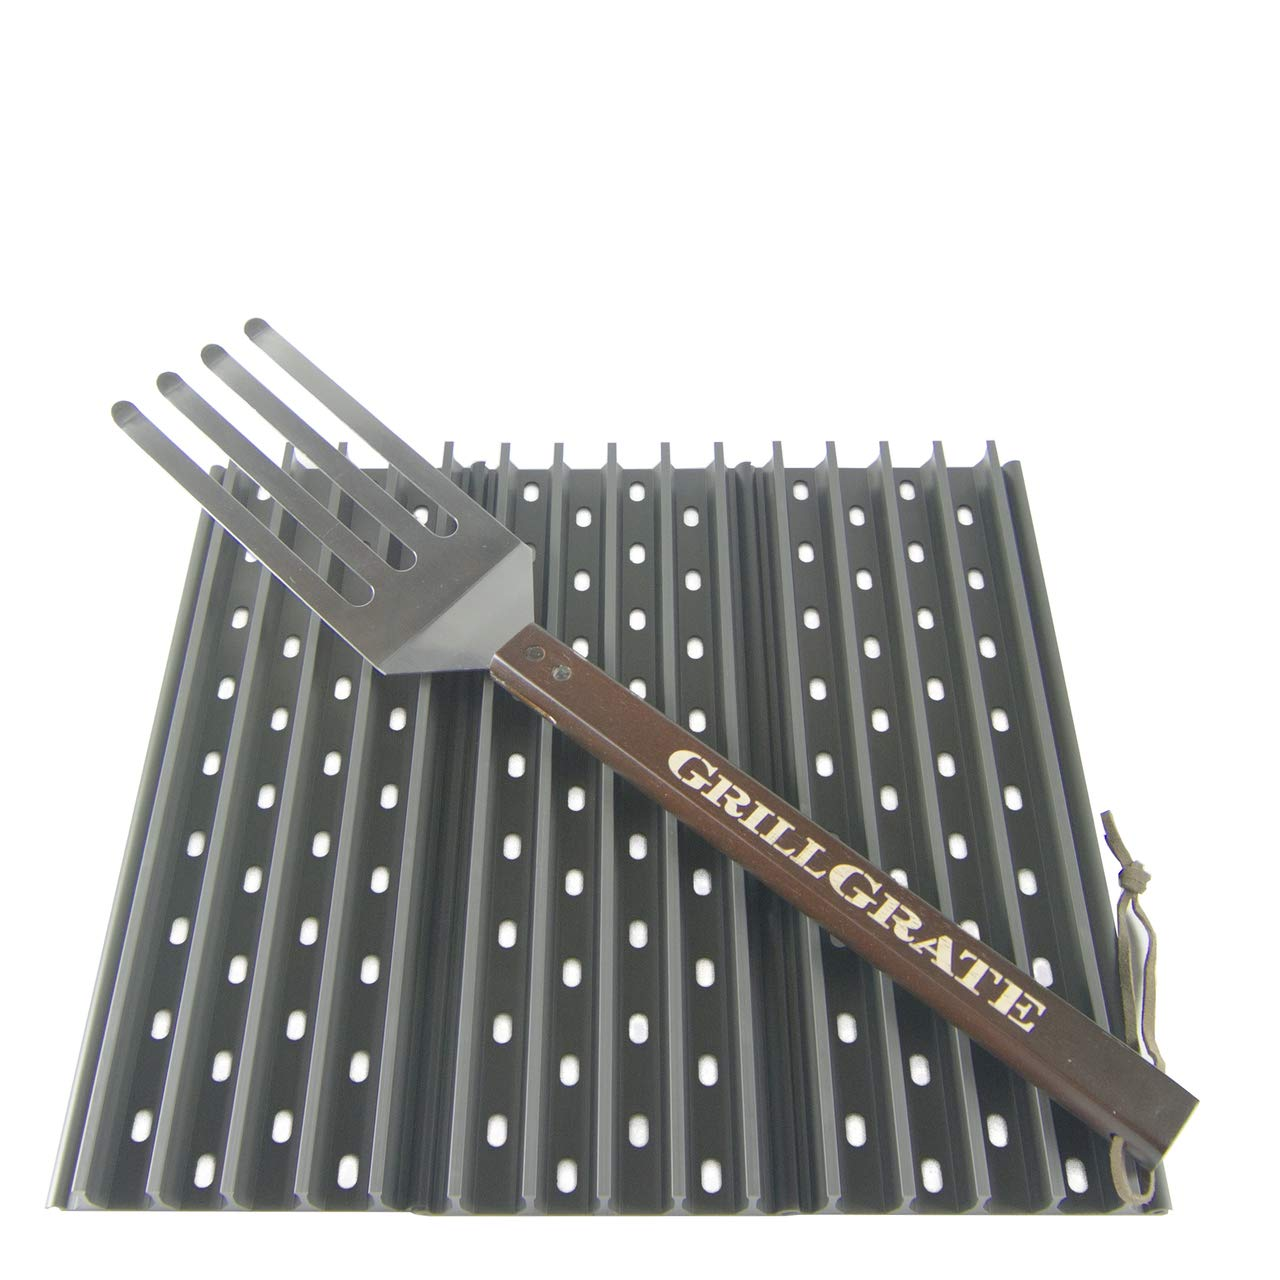 GrillGrate Set of Three 13.75'' (Interlocking) + Grate Tool by GrillGrate